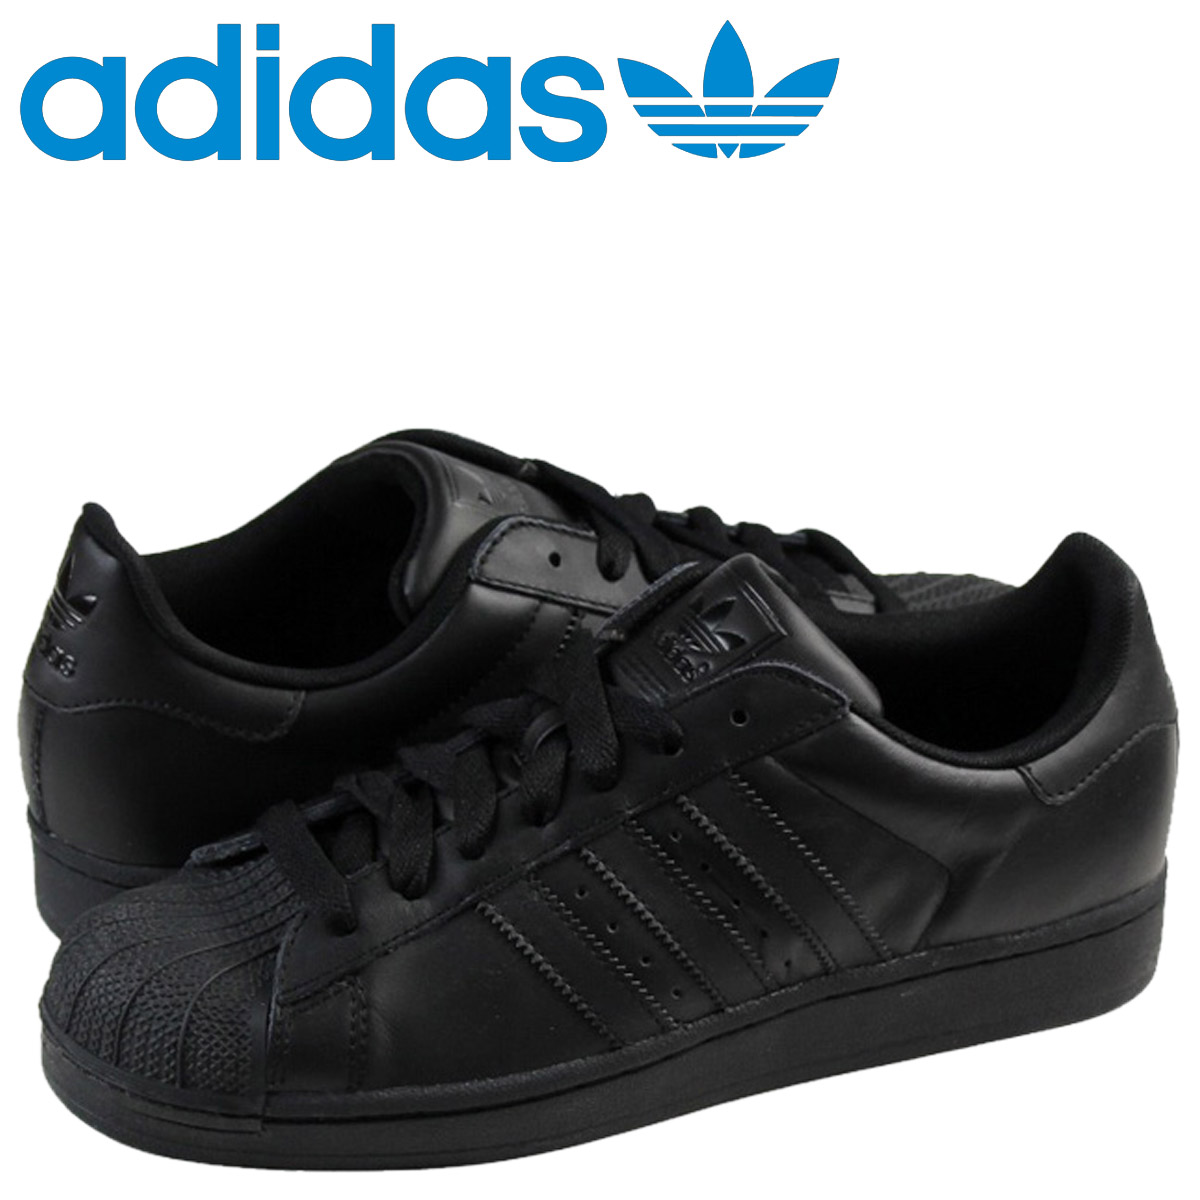 online store 64802 219db [SOLD OUT] adidas originals adidas Originals SUPERSTAR2 sneakers G14748  superstar 2 leather men's [regular]